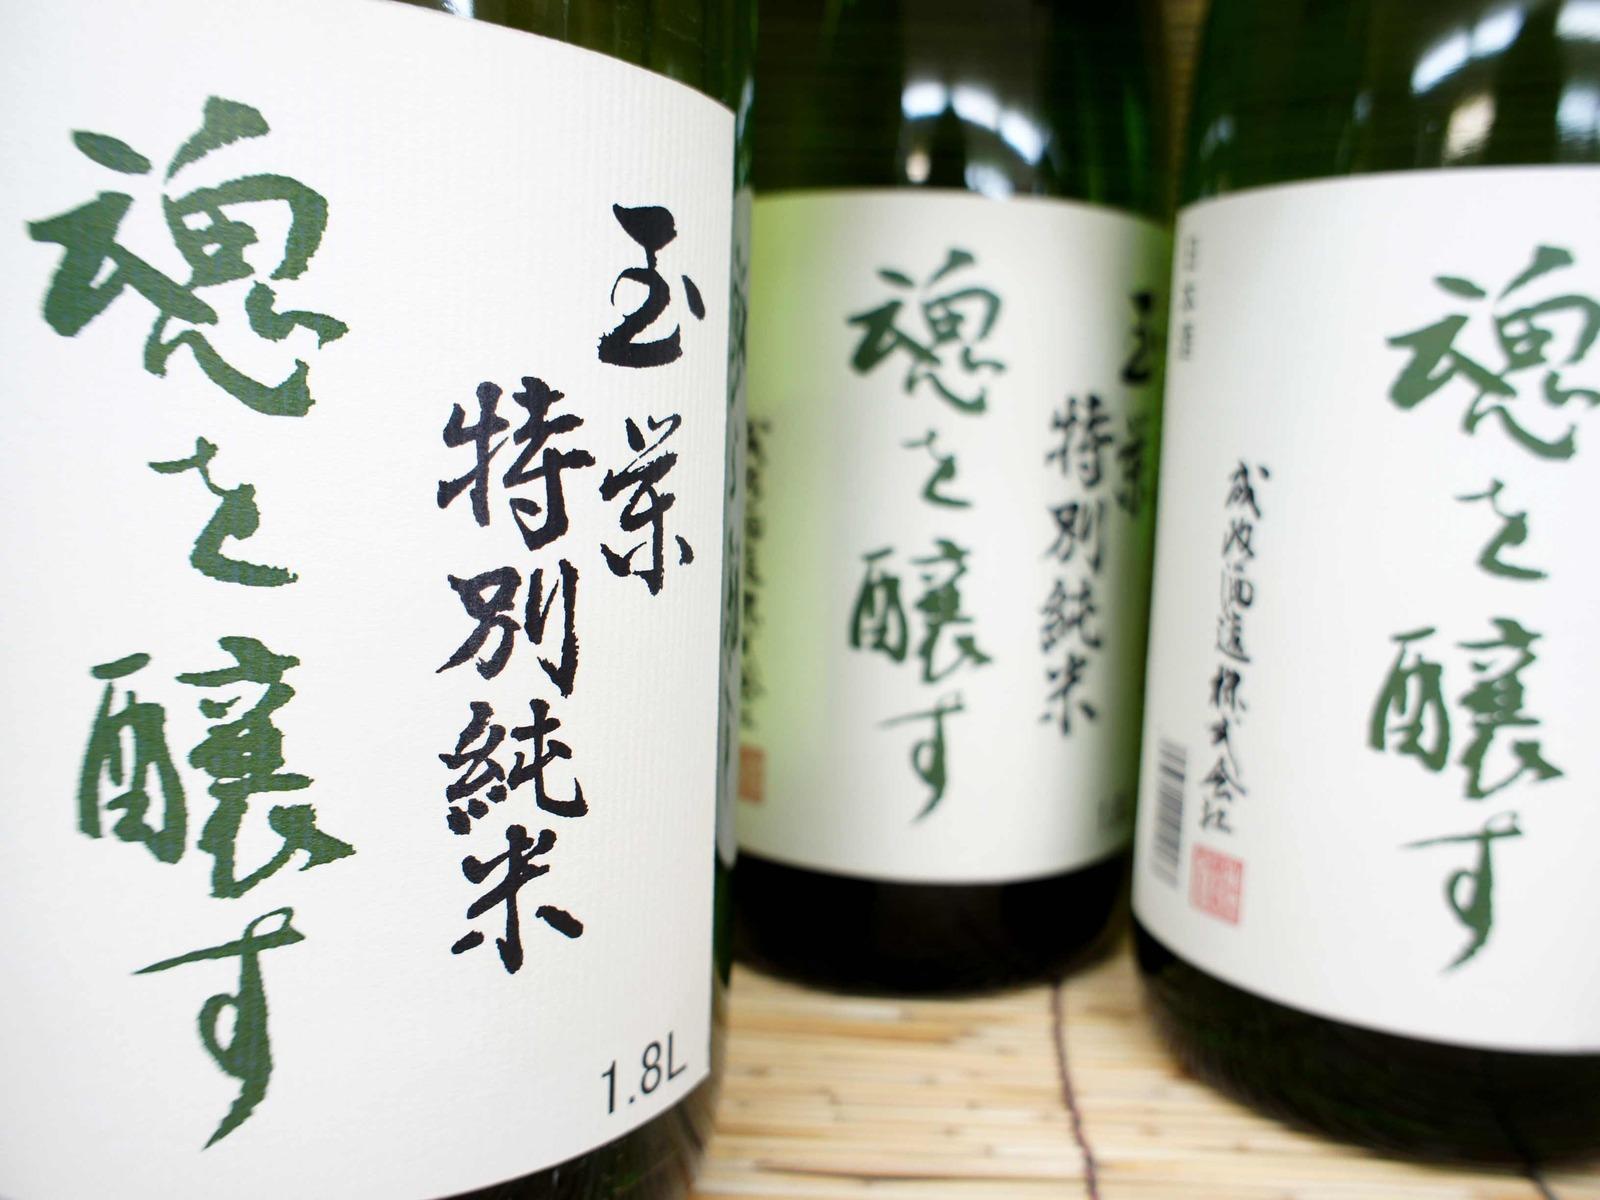 成政酒造 玉栄特別純米 魂を醸す